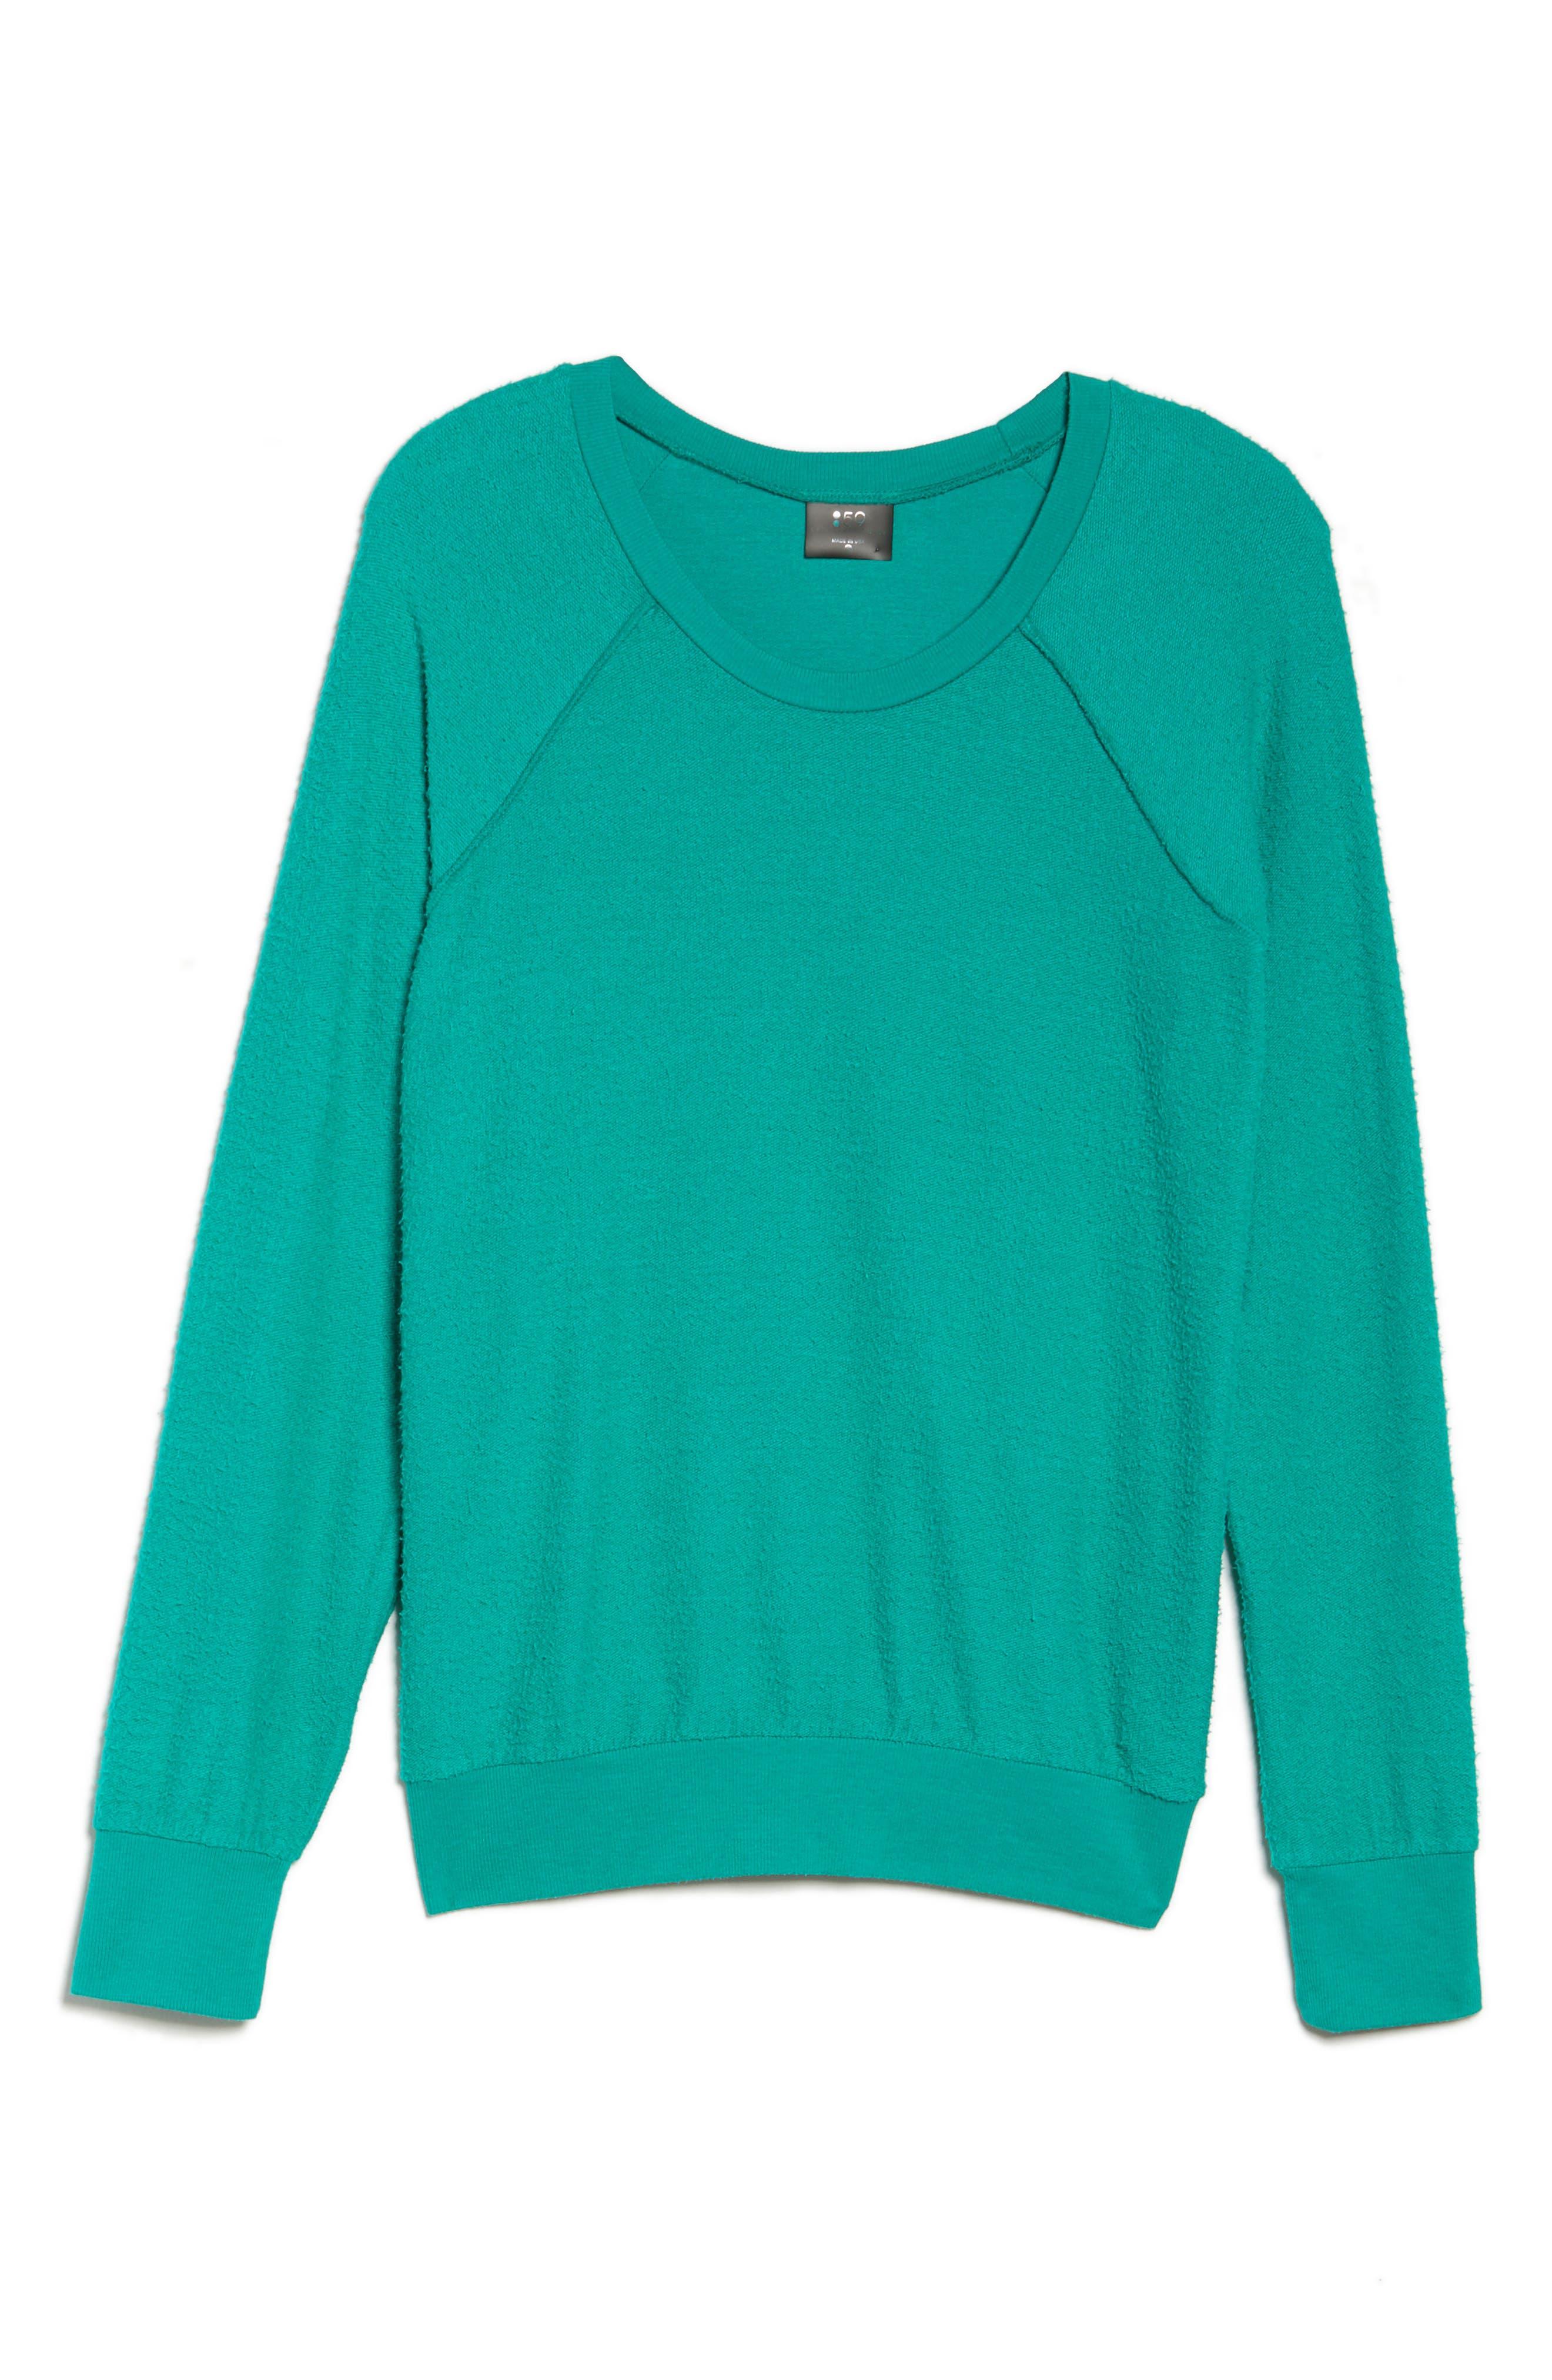 Edge Sweatshirt,                             Alternate thumbnail 7, color,                             Kelly